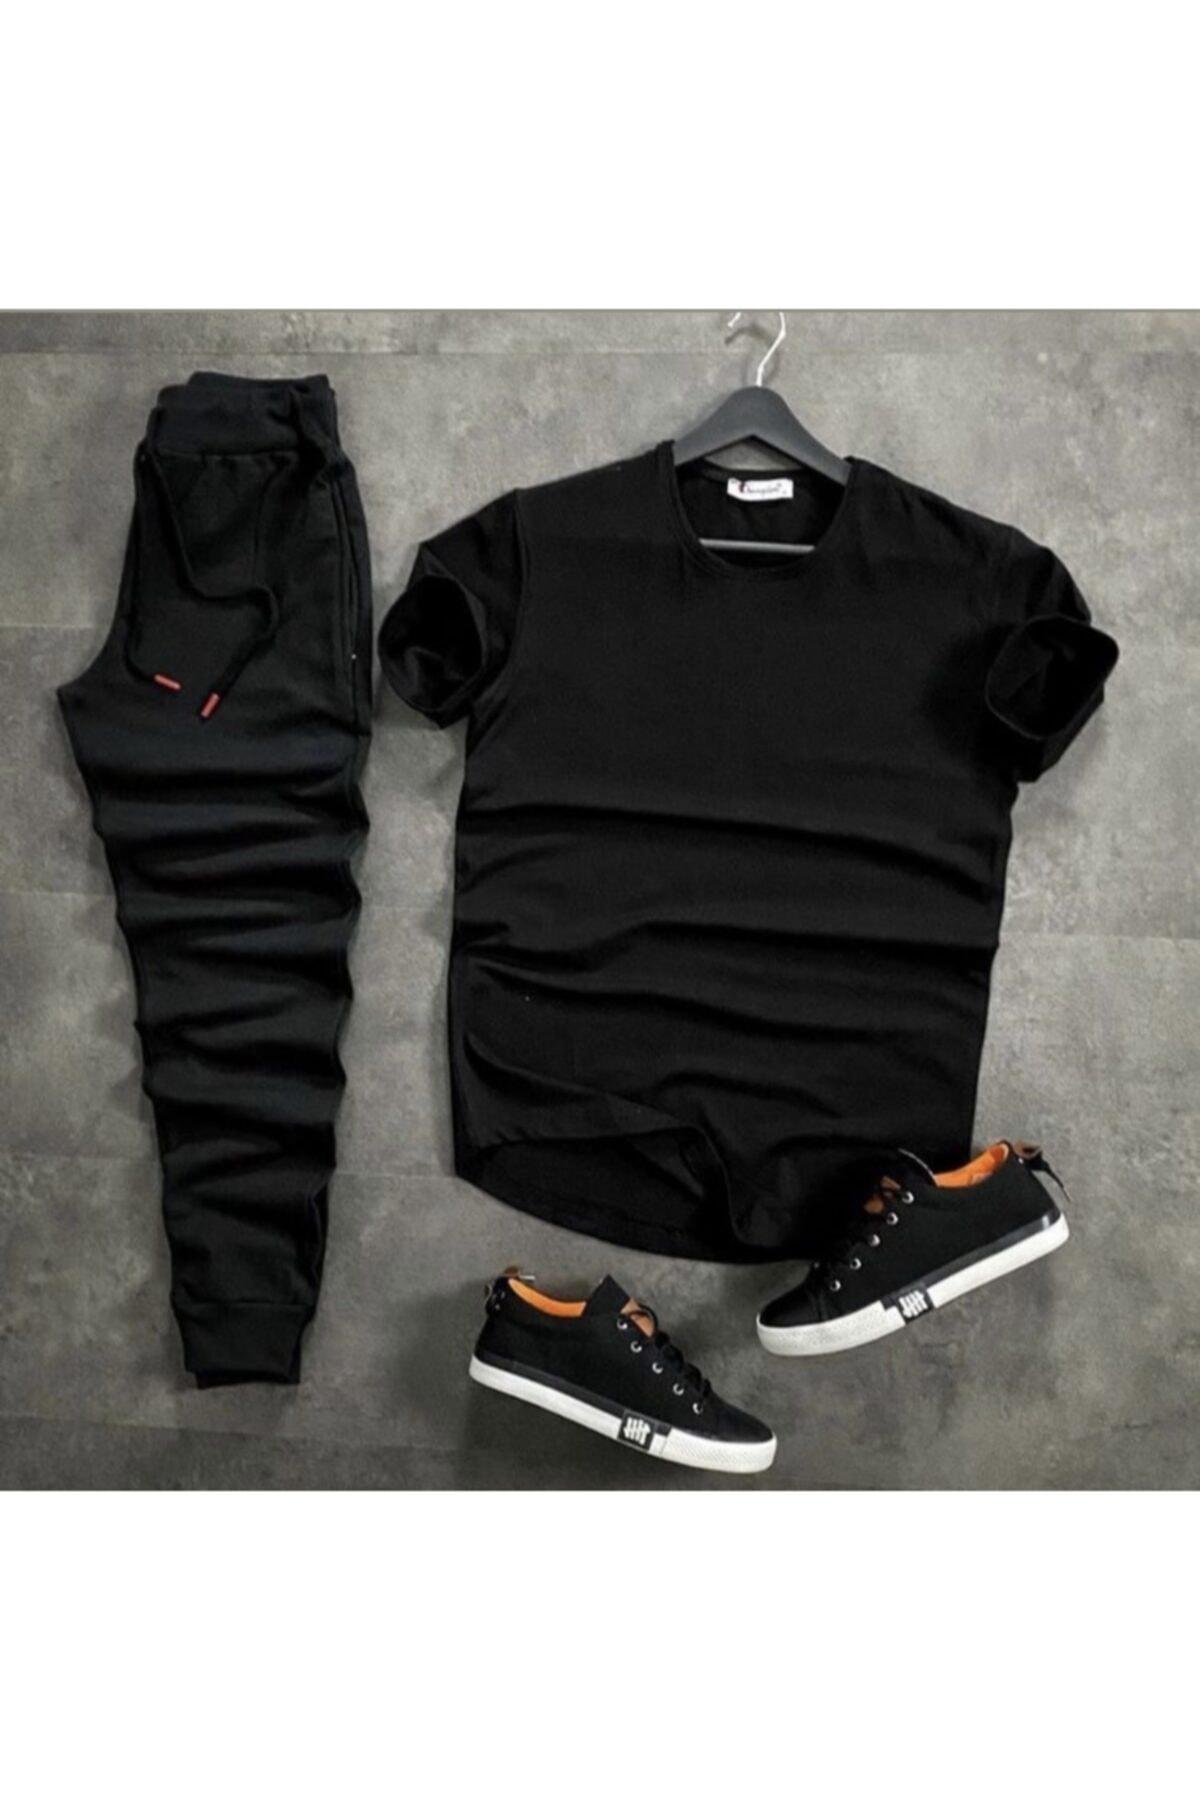 Düz Basic Tshirt Eşofman Takım